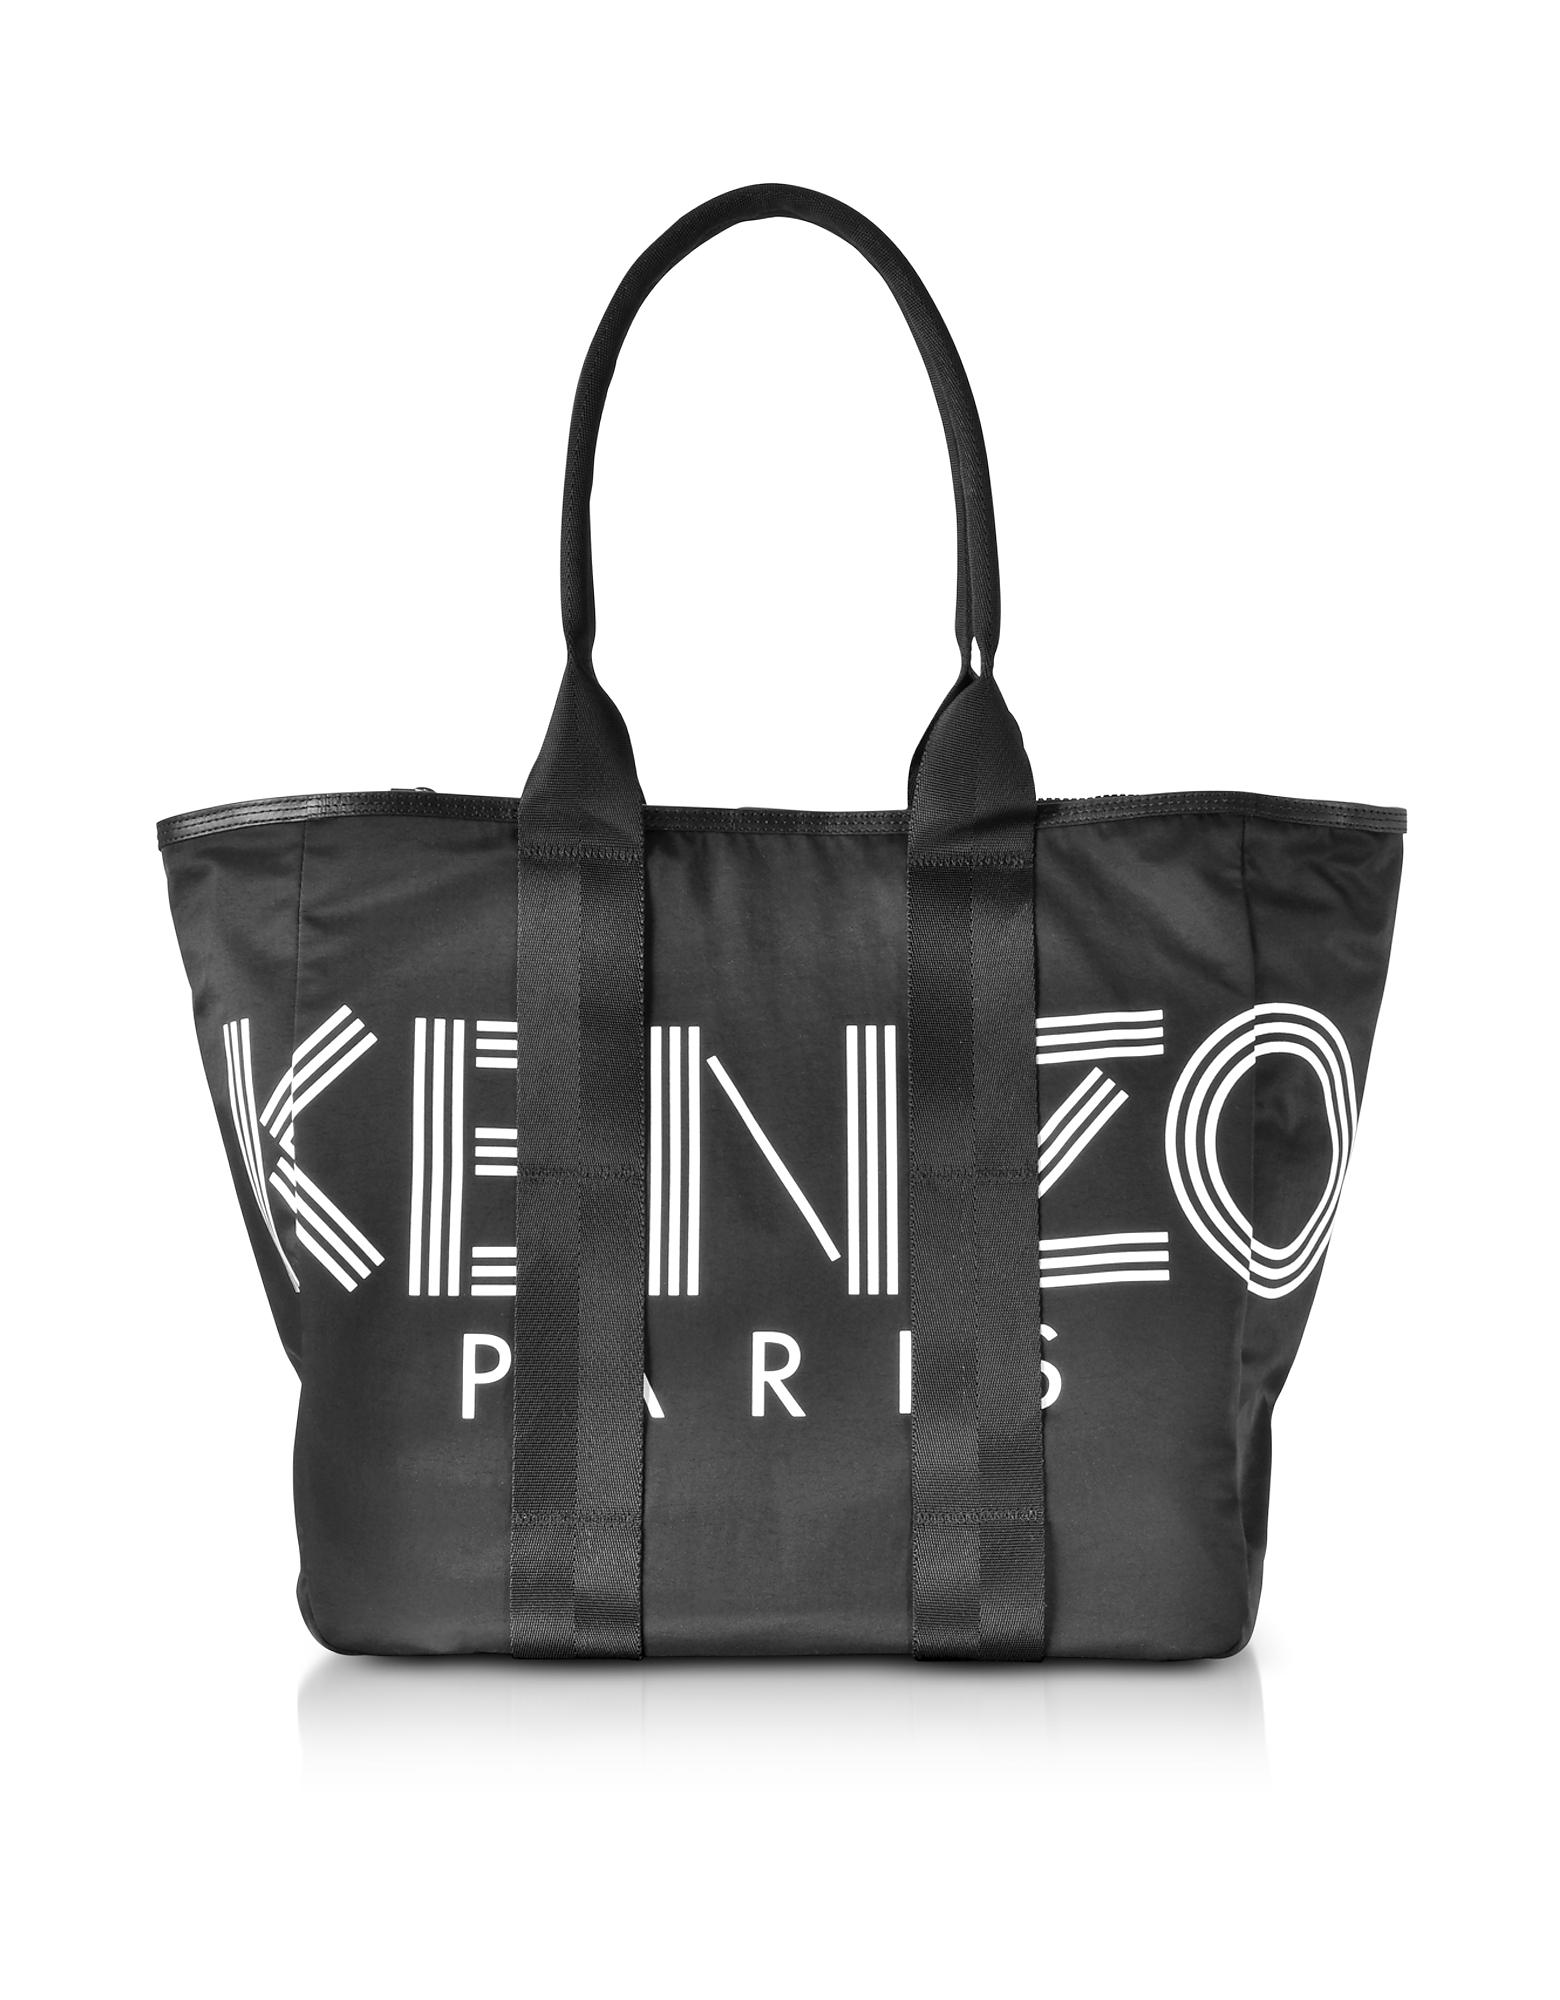 Kenzo Sport Black Nylon Tote Bag